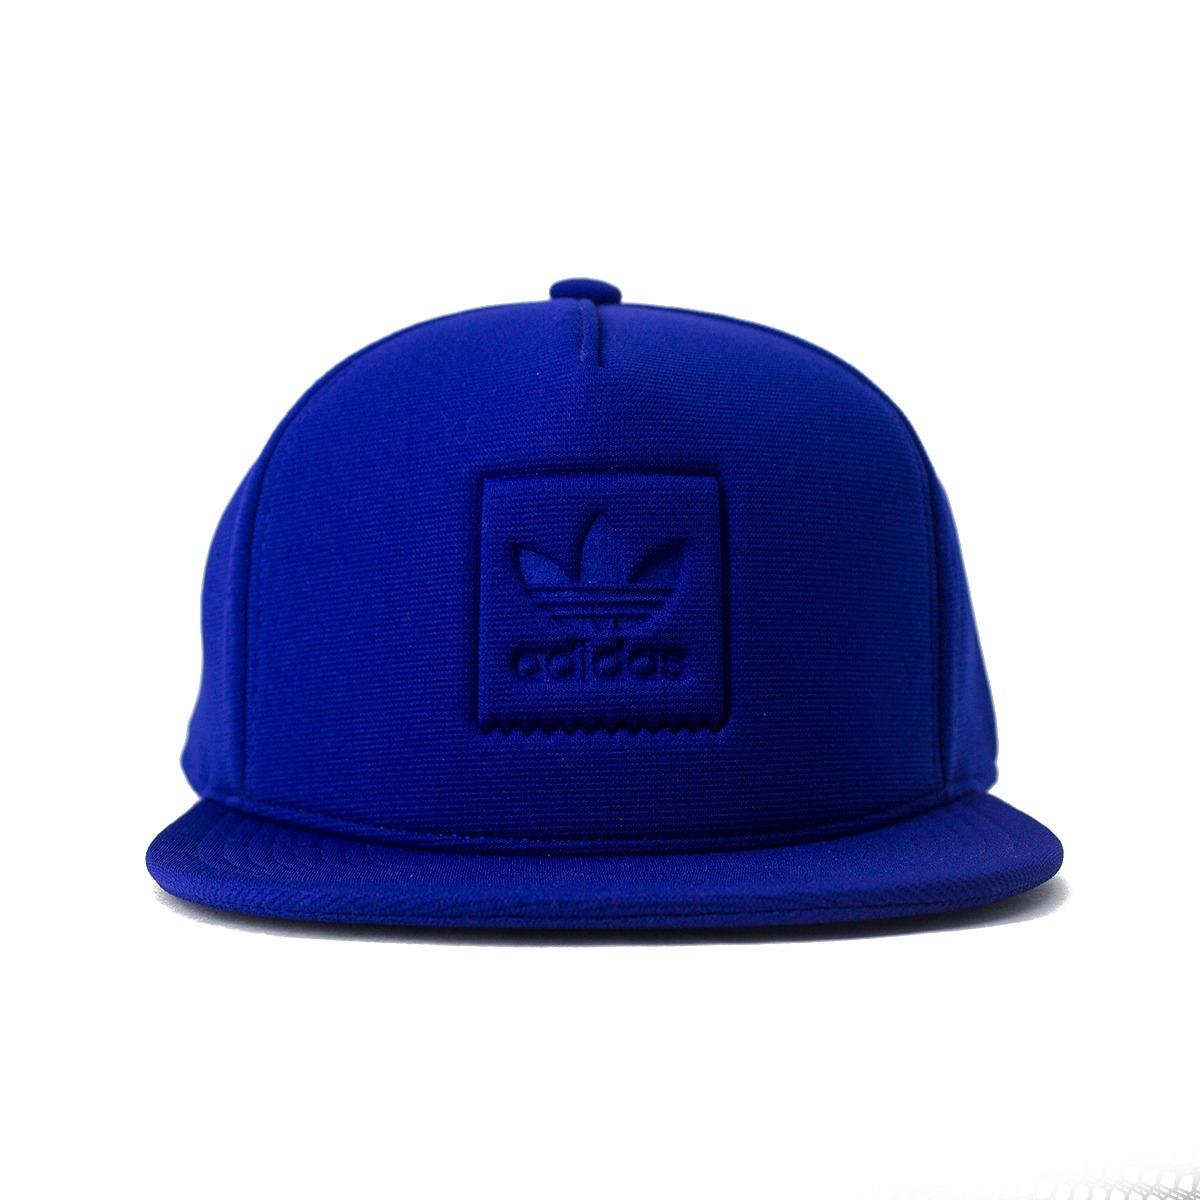 bone adidas snapback inject azul original. Carregando zoom. 6cddb20fc68